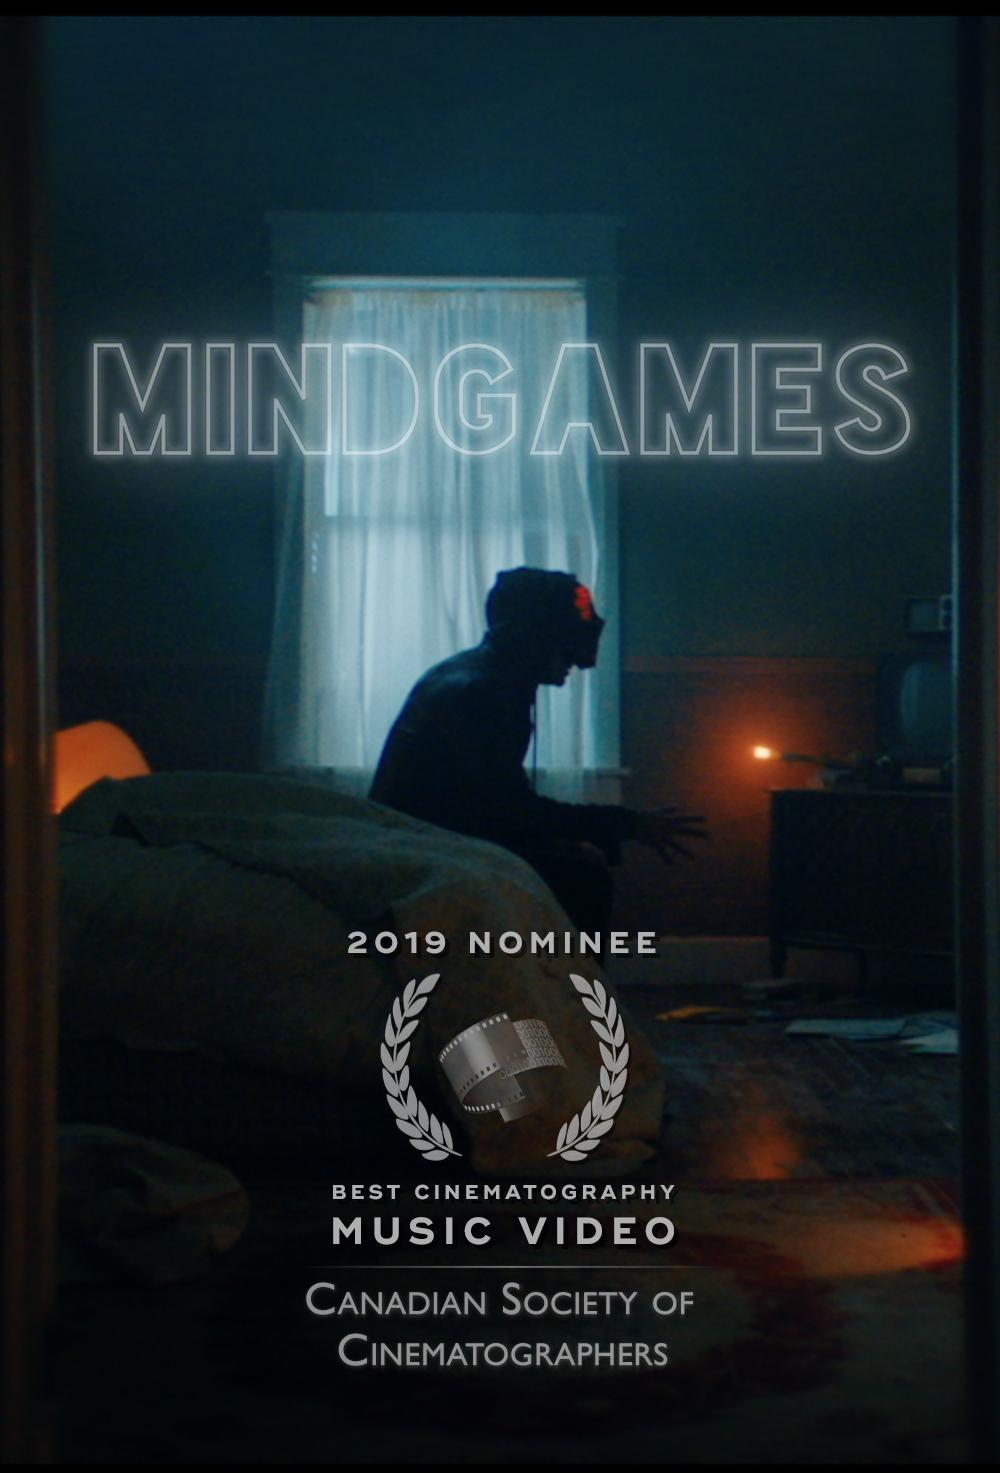 2019_Nominee_MindGames_Poster.jpg